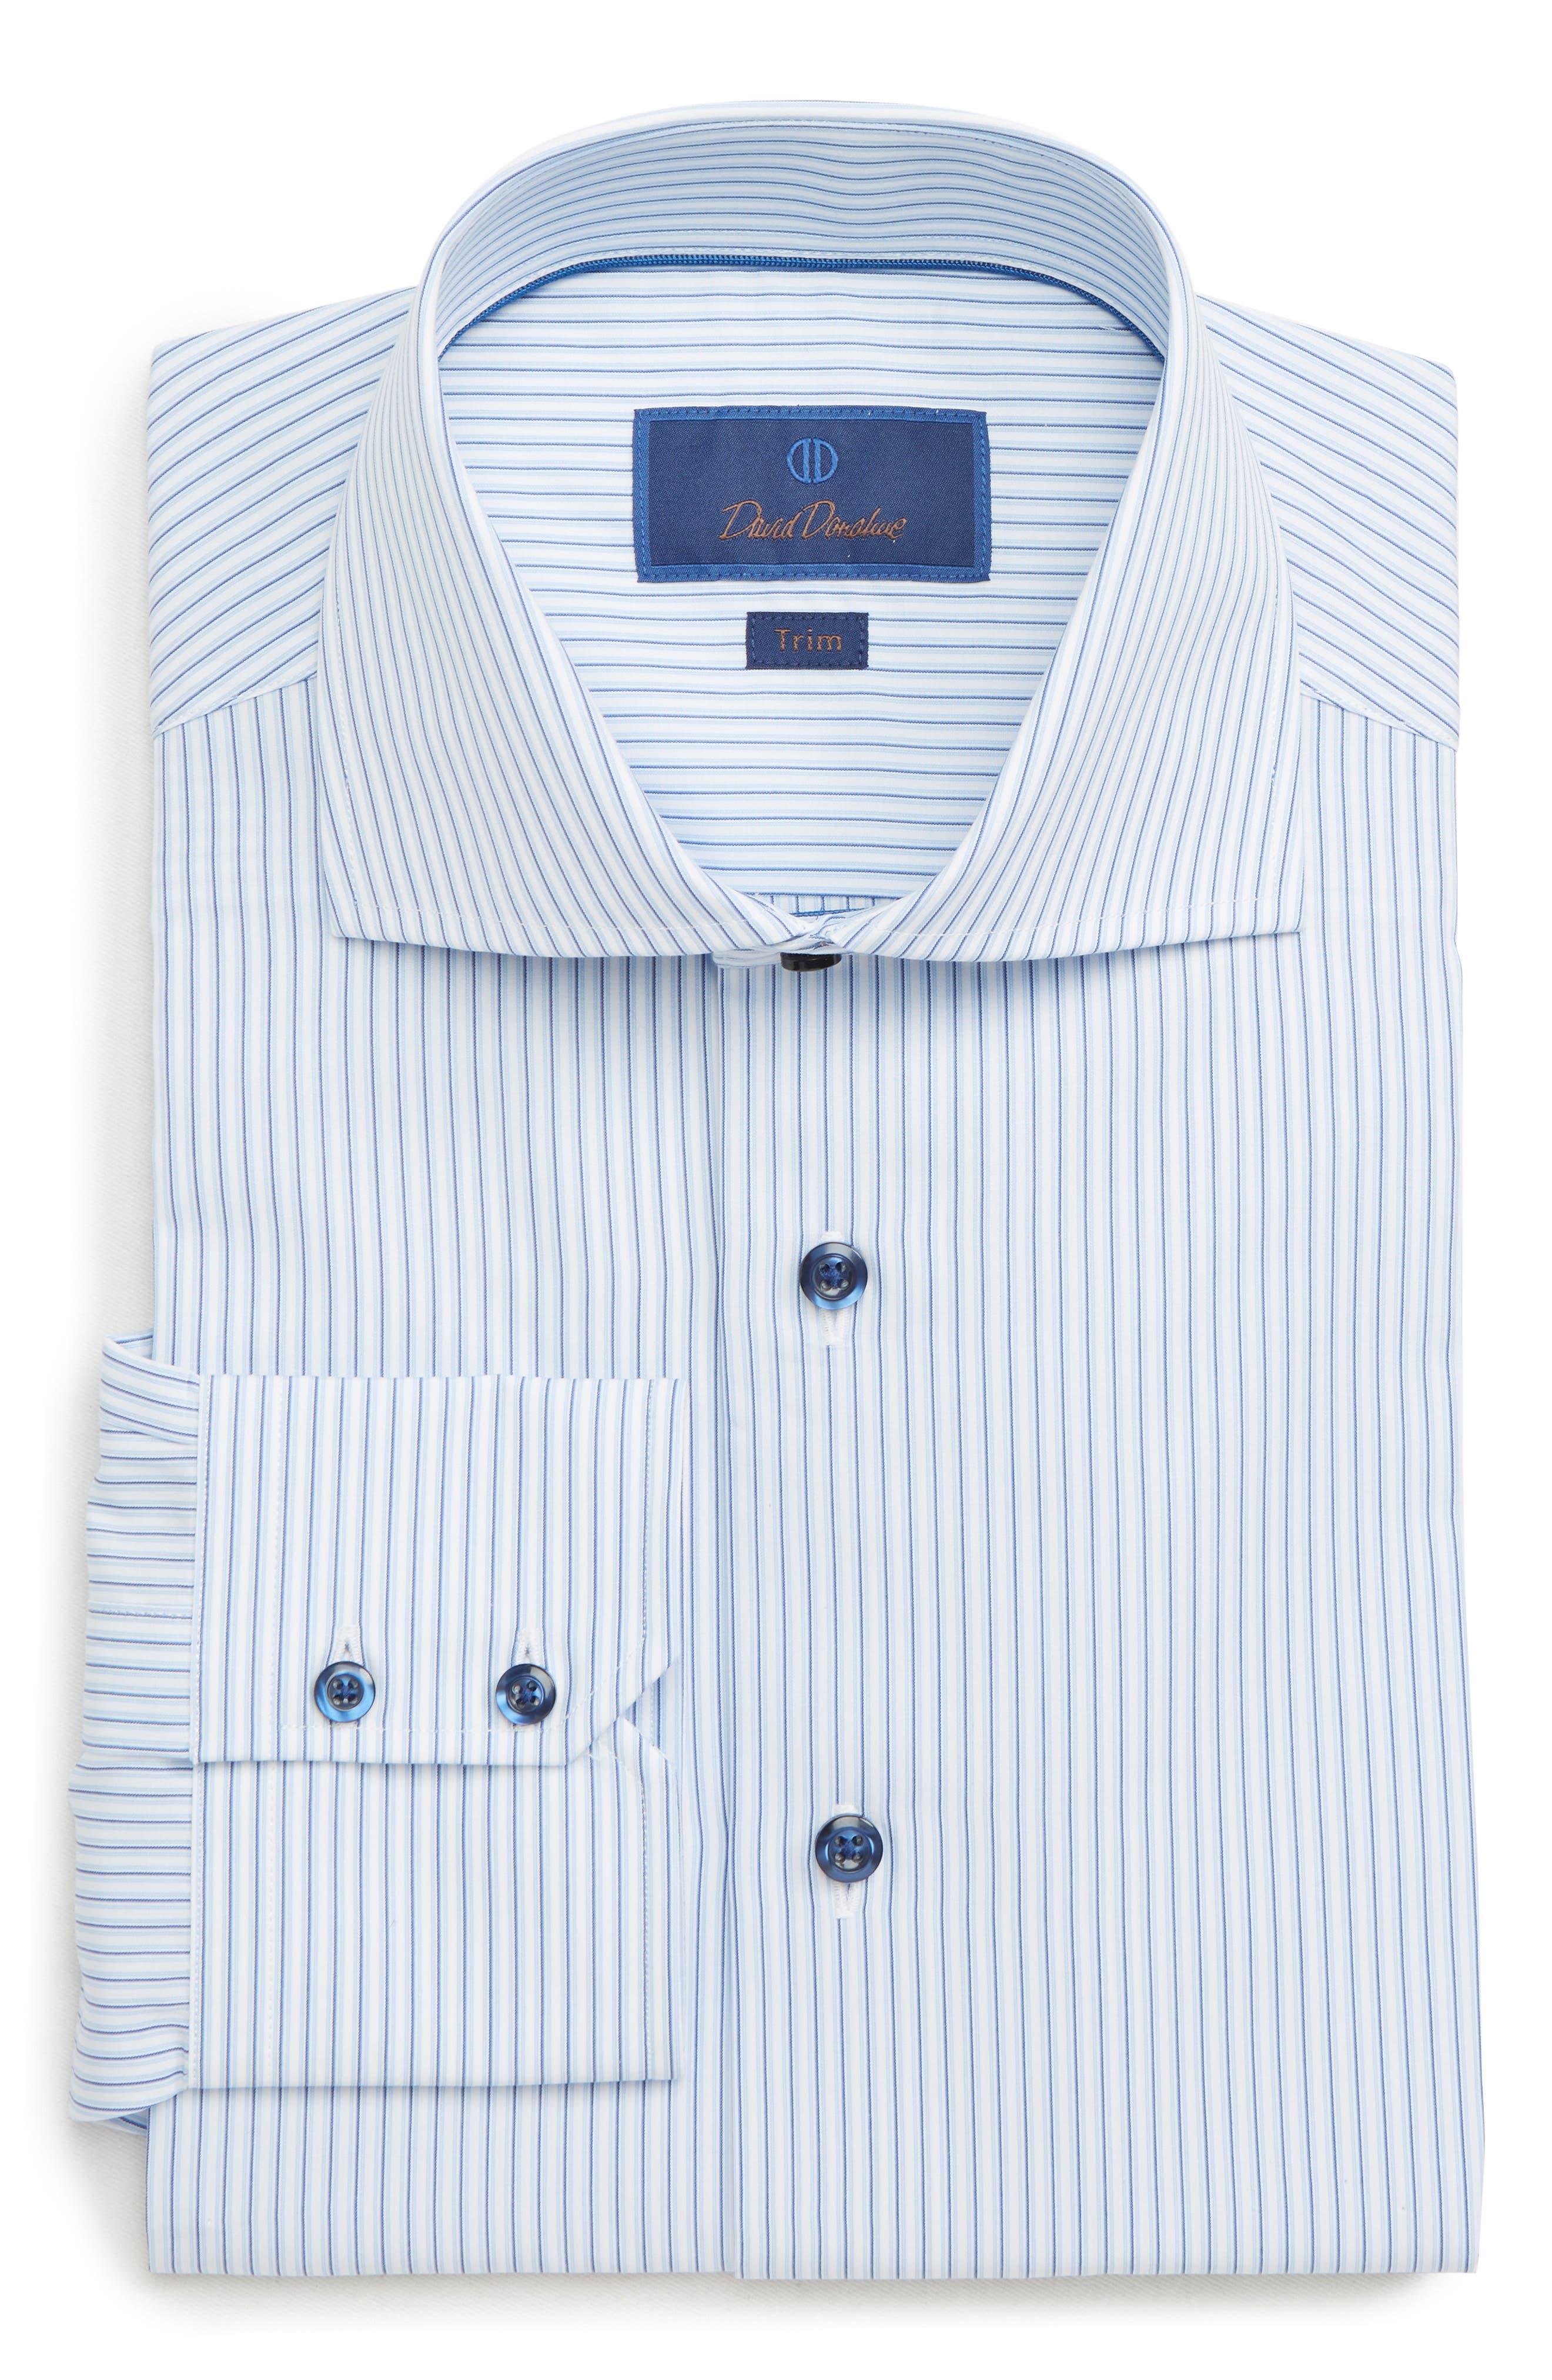 Trim Fit Stripe Dress Shirt,                             Main thumbnail 1, color,                             WHITE/ BLUE